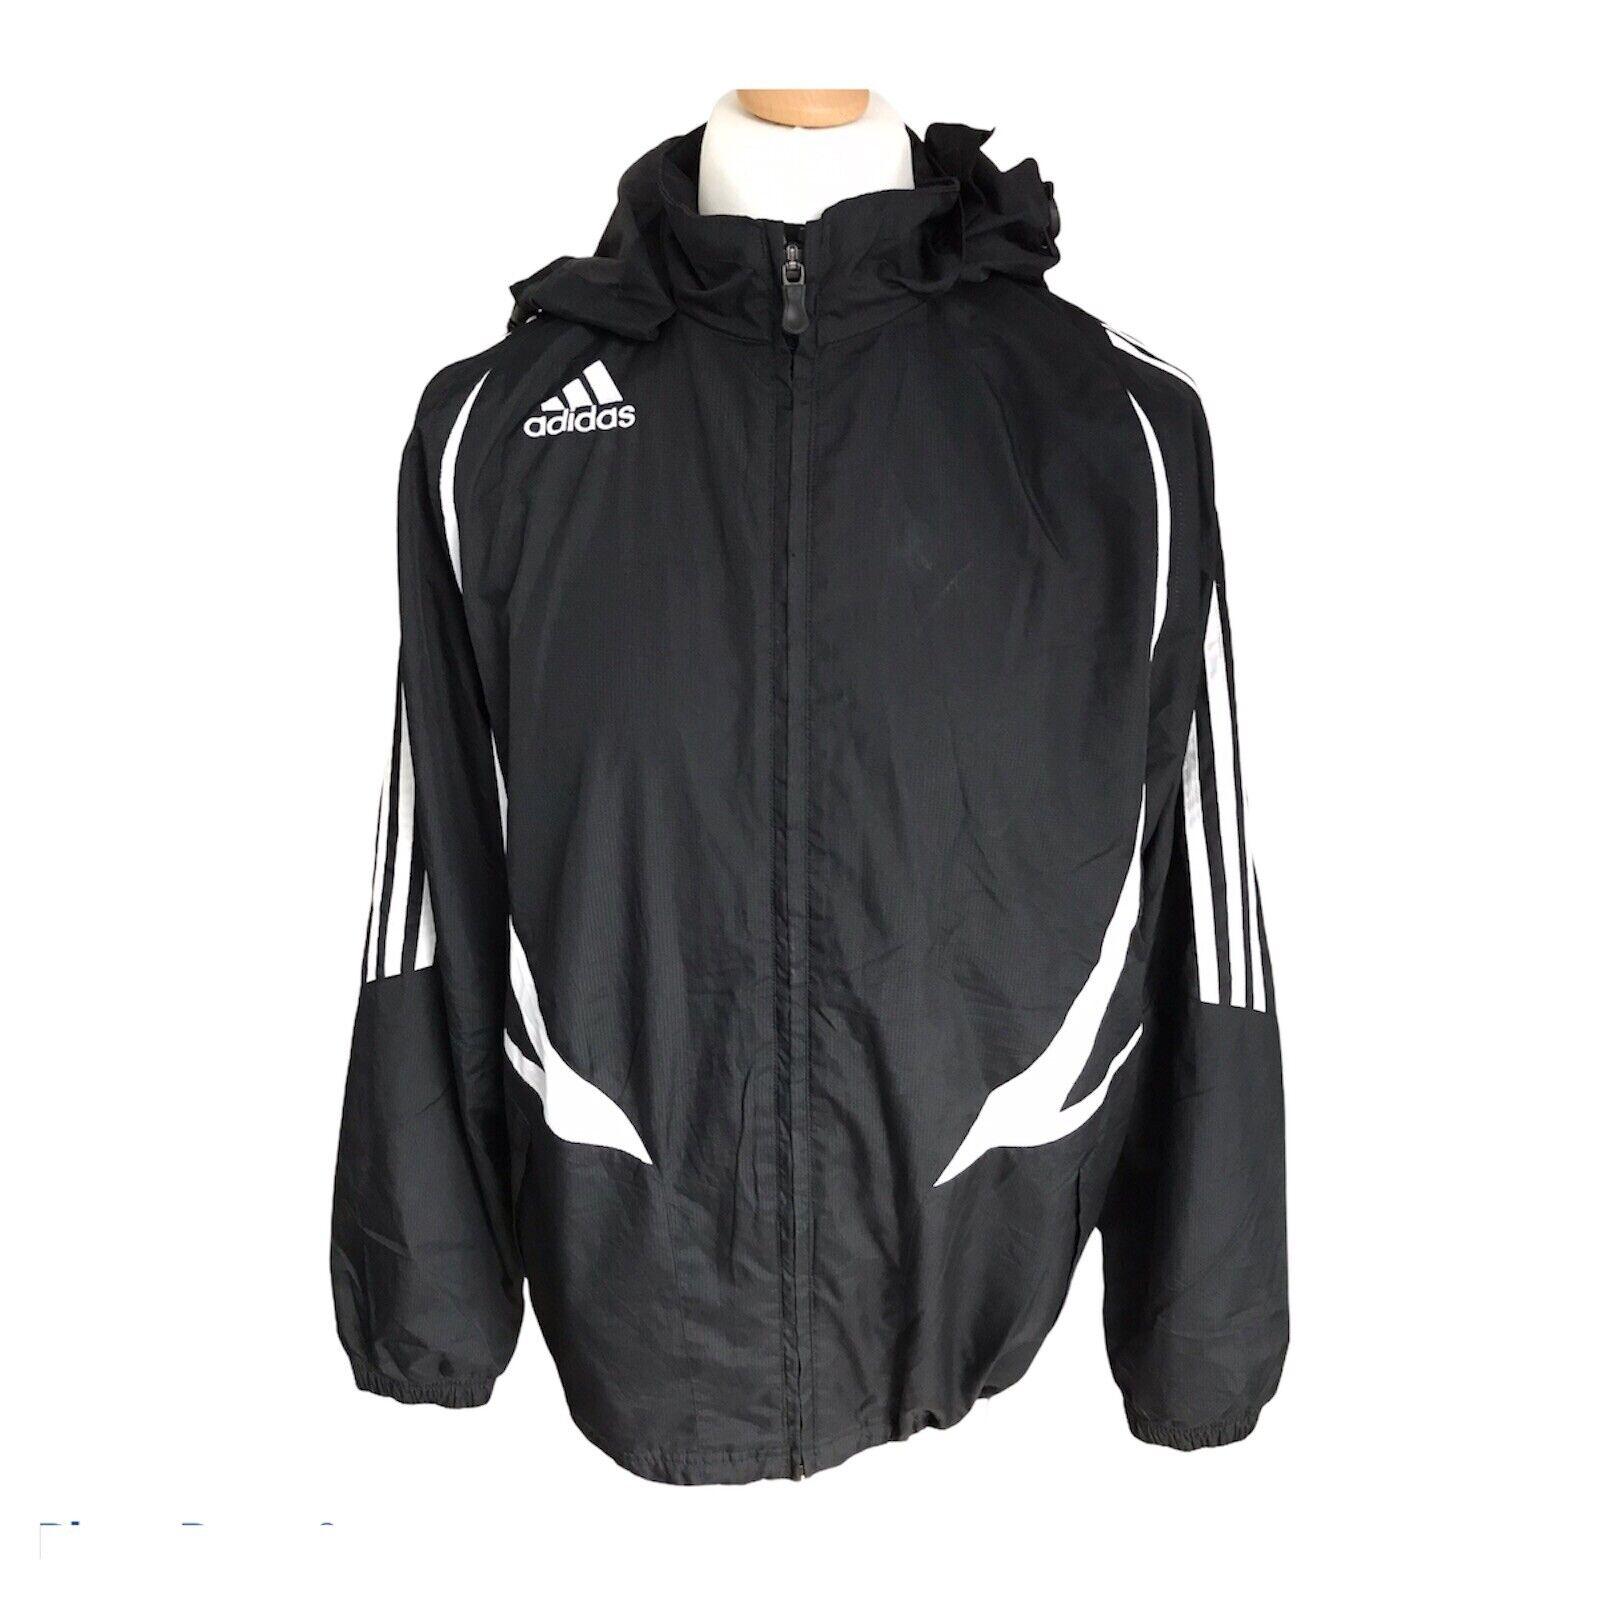 Chaqueta Negra De Fútbol Adidas UK 36/38 Academia Pequeño Adulto Excelente con de Oregon